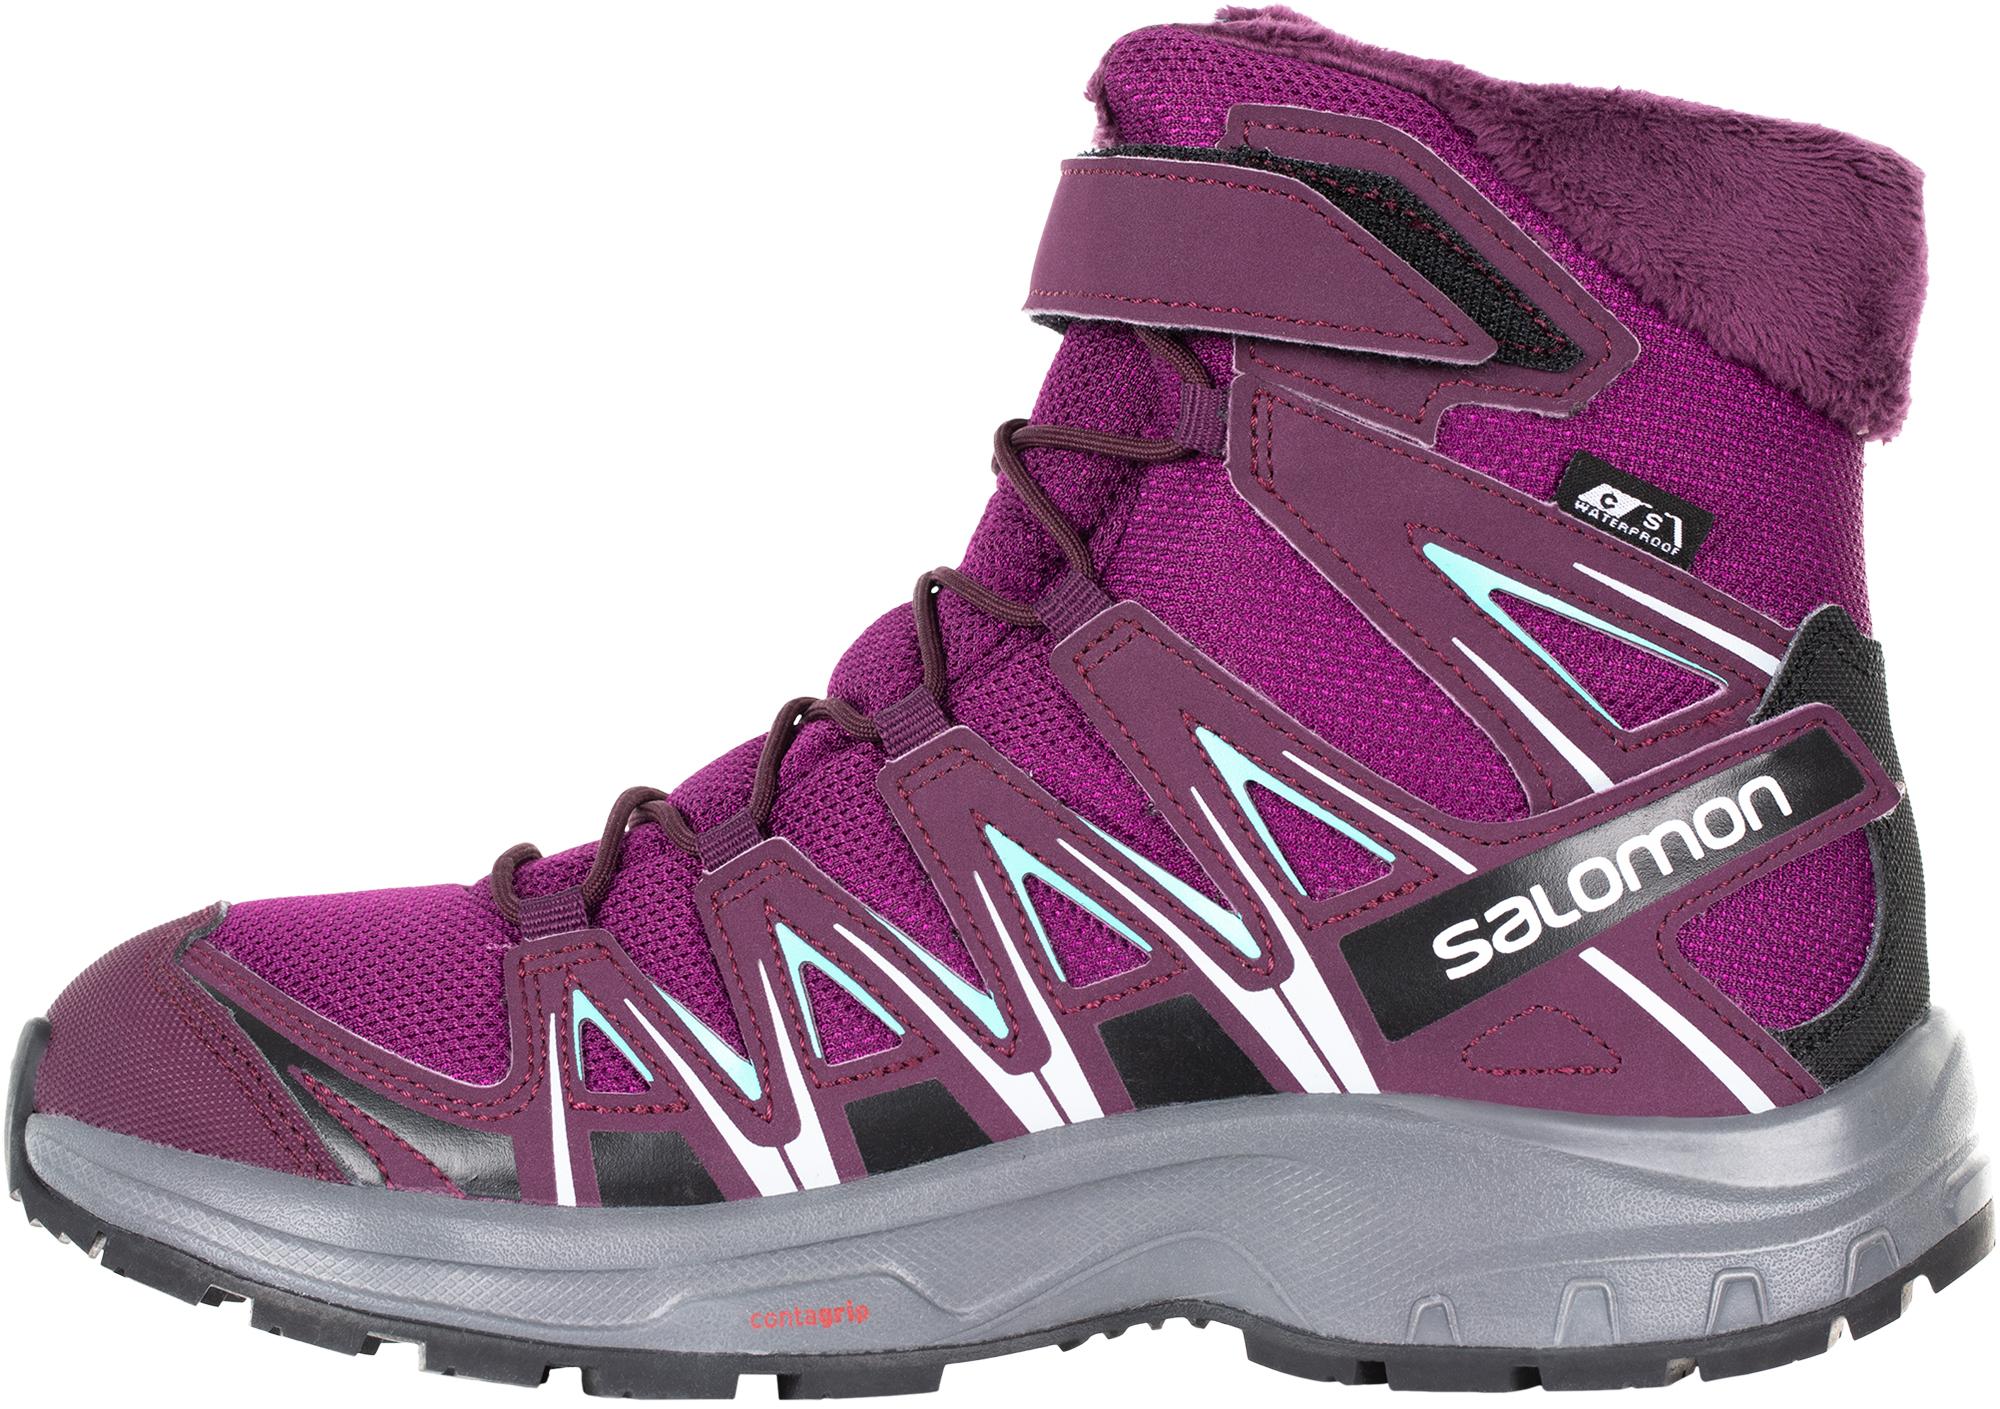 Salomon Сапоги утепленные для девочек XA PRO 3D Winter TS CSWP J, размер 33